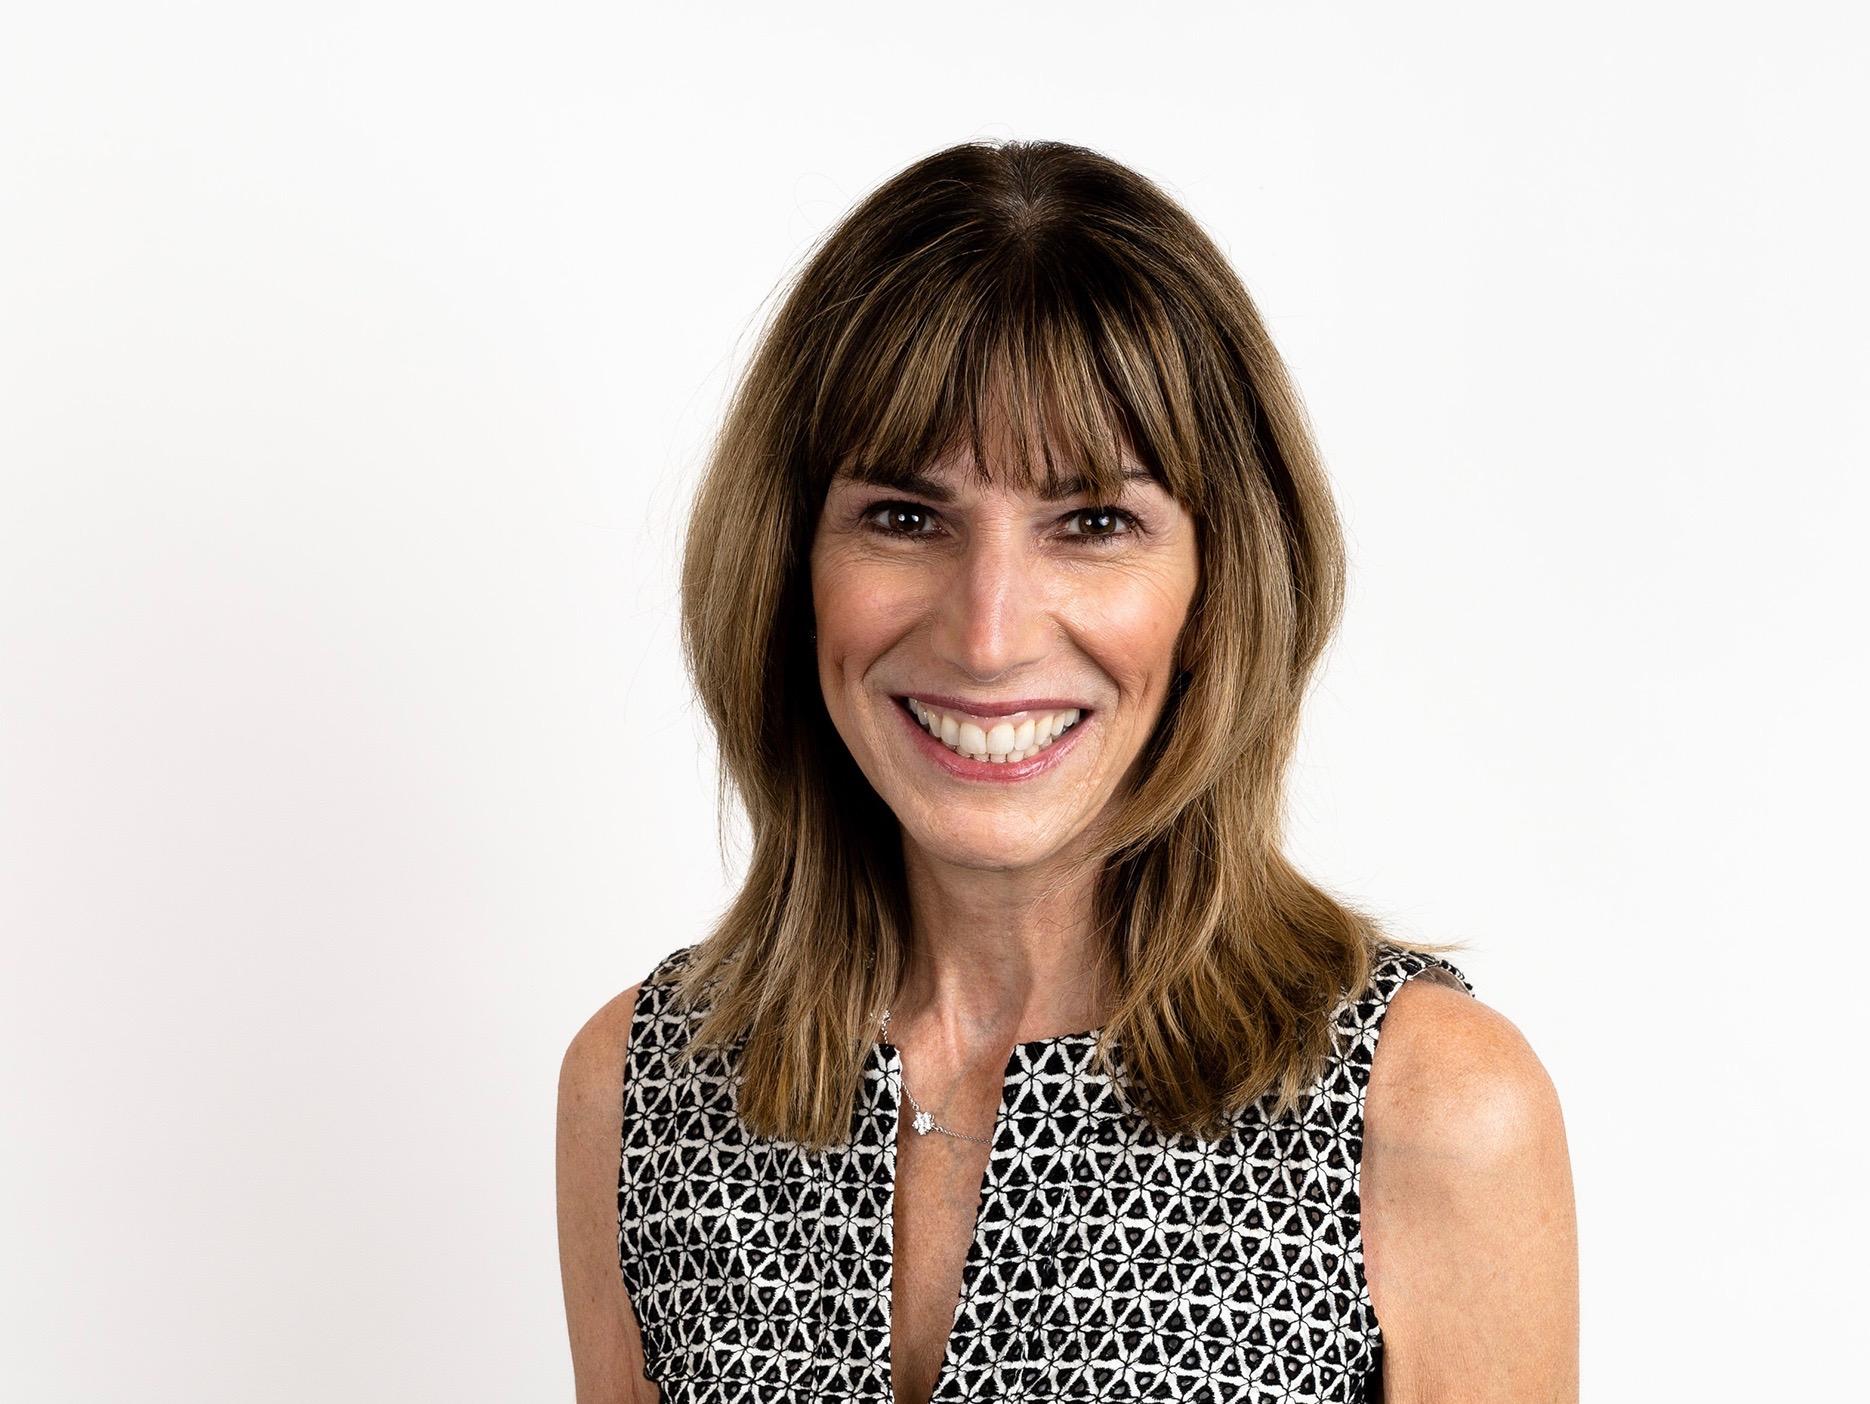 Lisa Radist - Director of Strategic Partnerships, theAudience